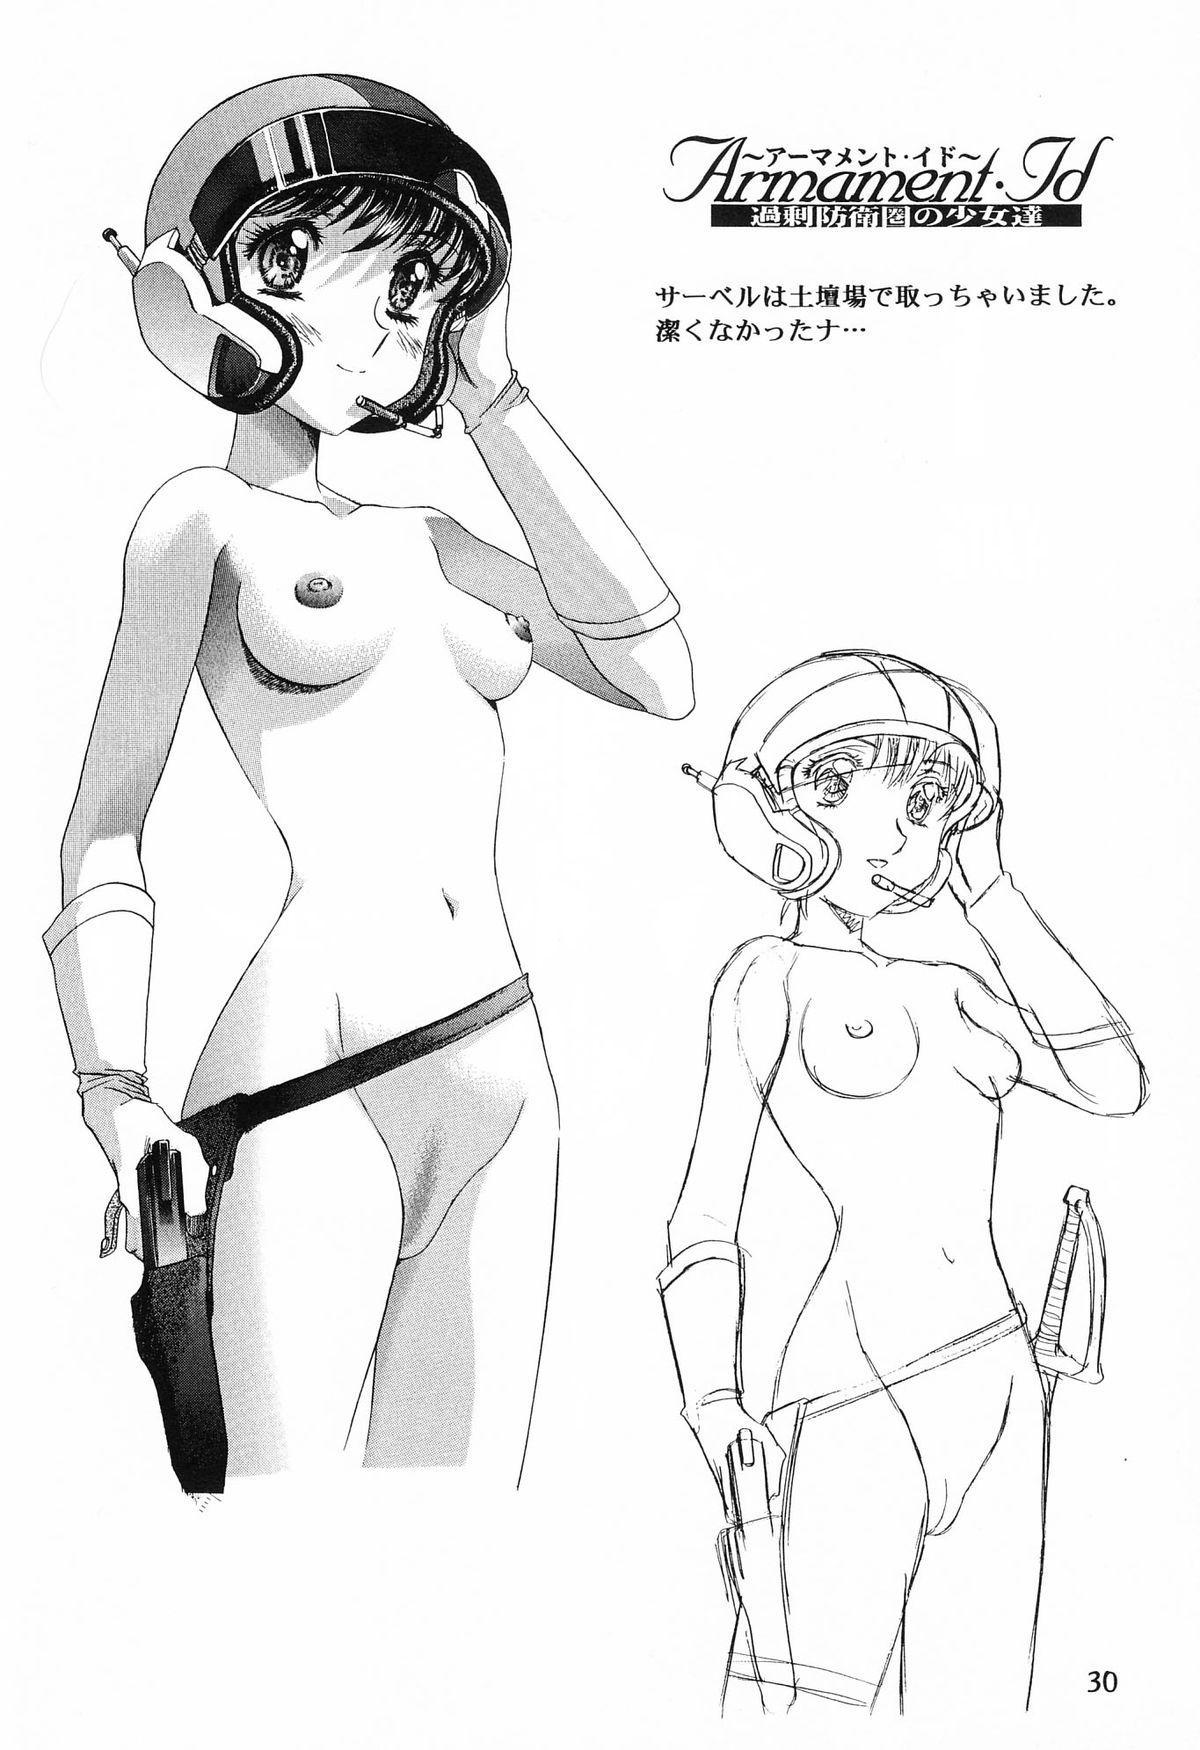 Henrei-kai '98 Natsu SPECIAL 31